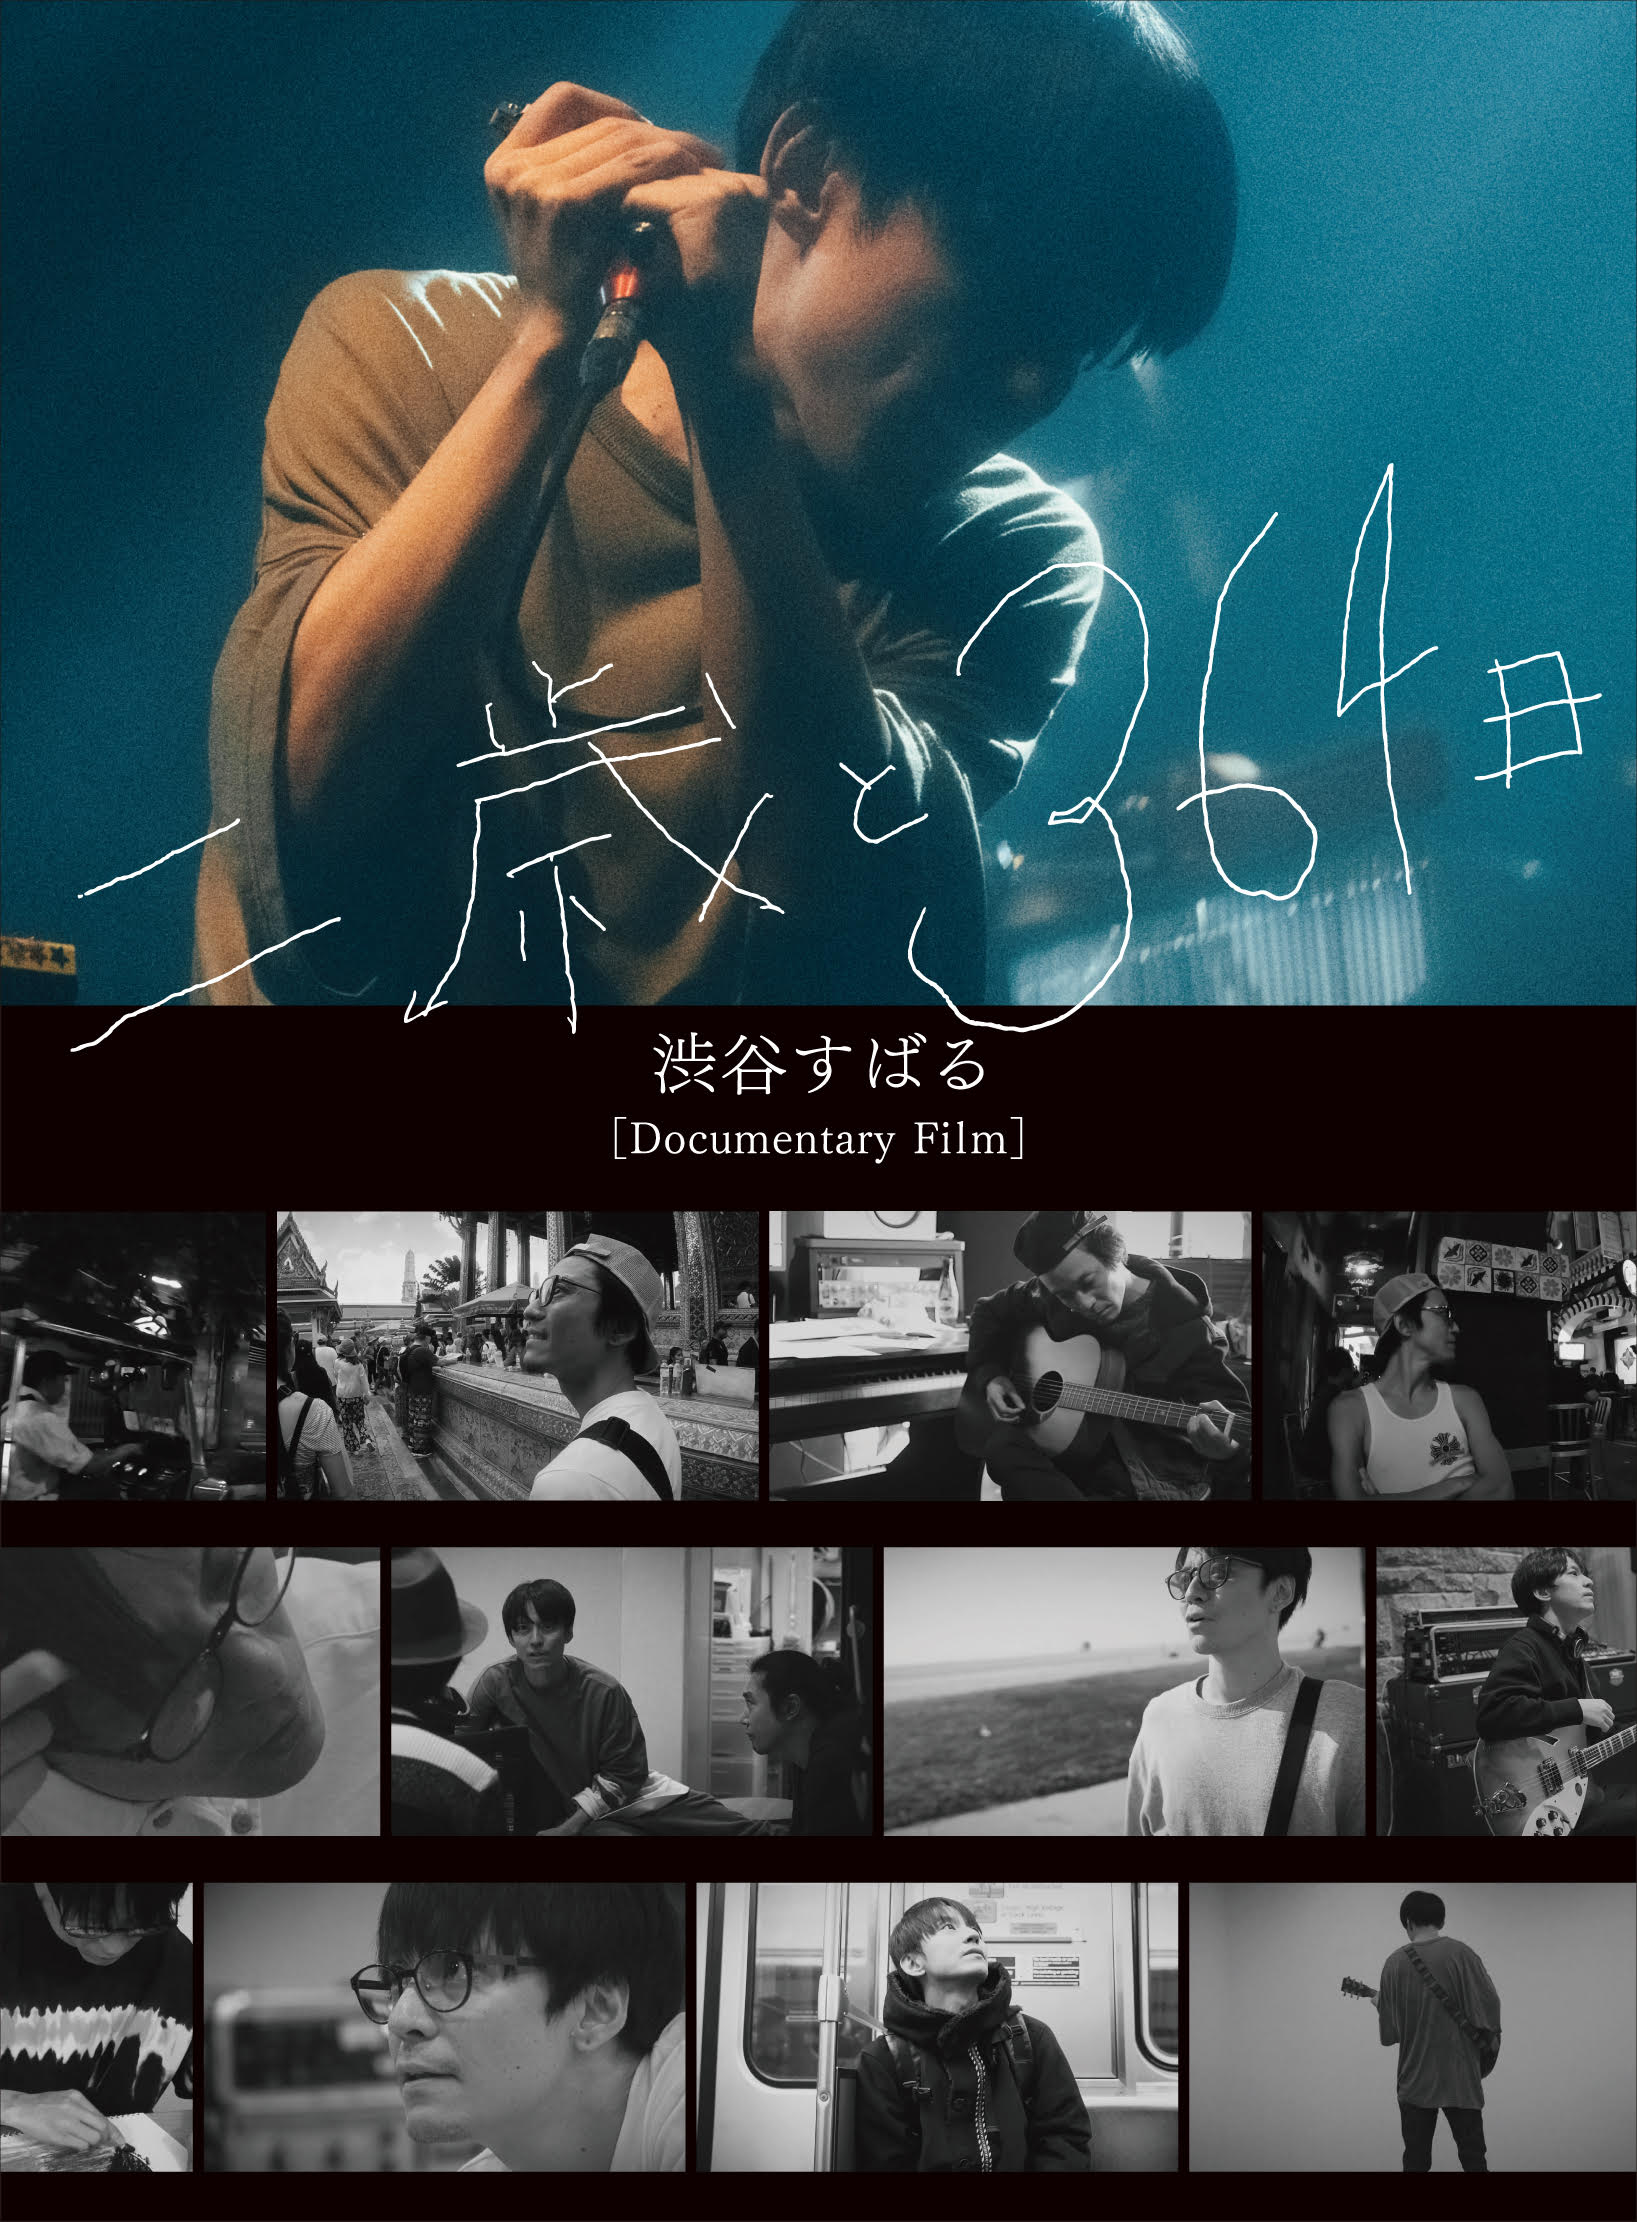 Documentary Film 「二歳と364日」